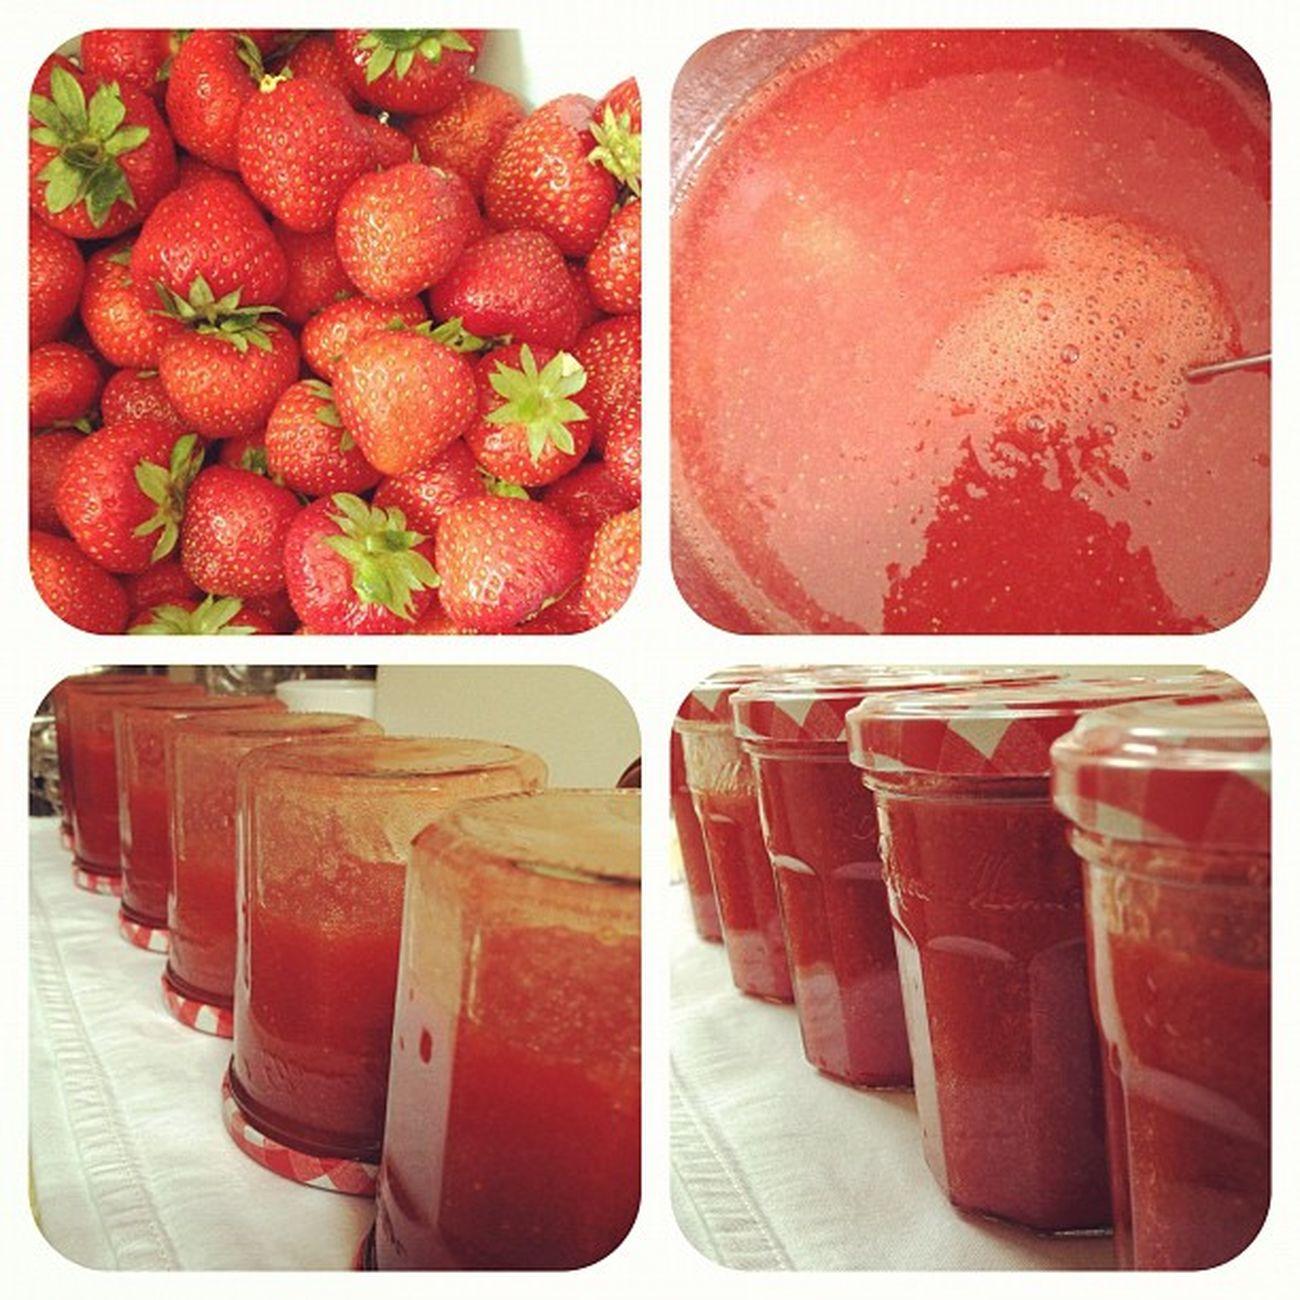 Fertig ist meine #Bombay #Erdbeer #Marmelade :-) Bombay Marmelade Erdbeer Erdbeermarmelade